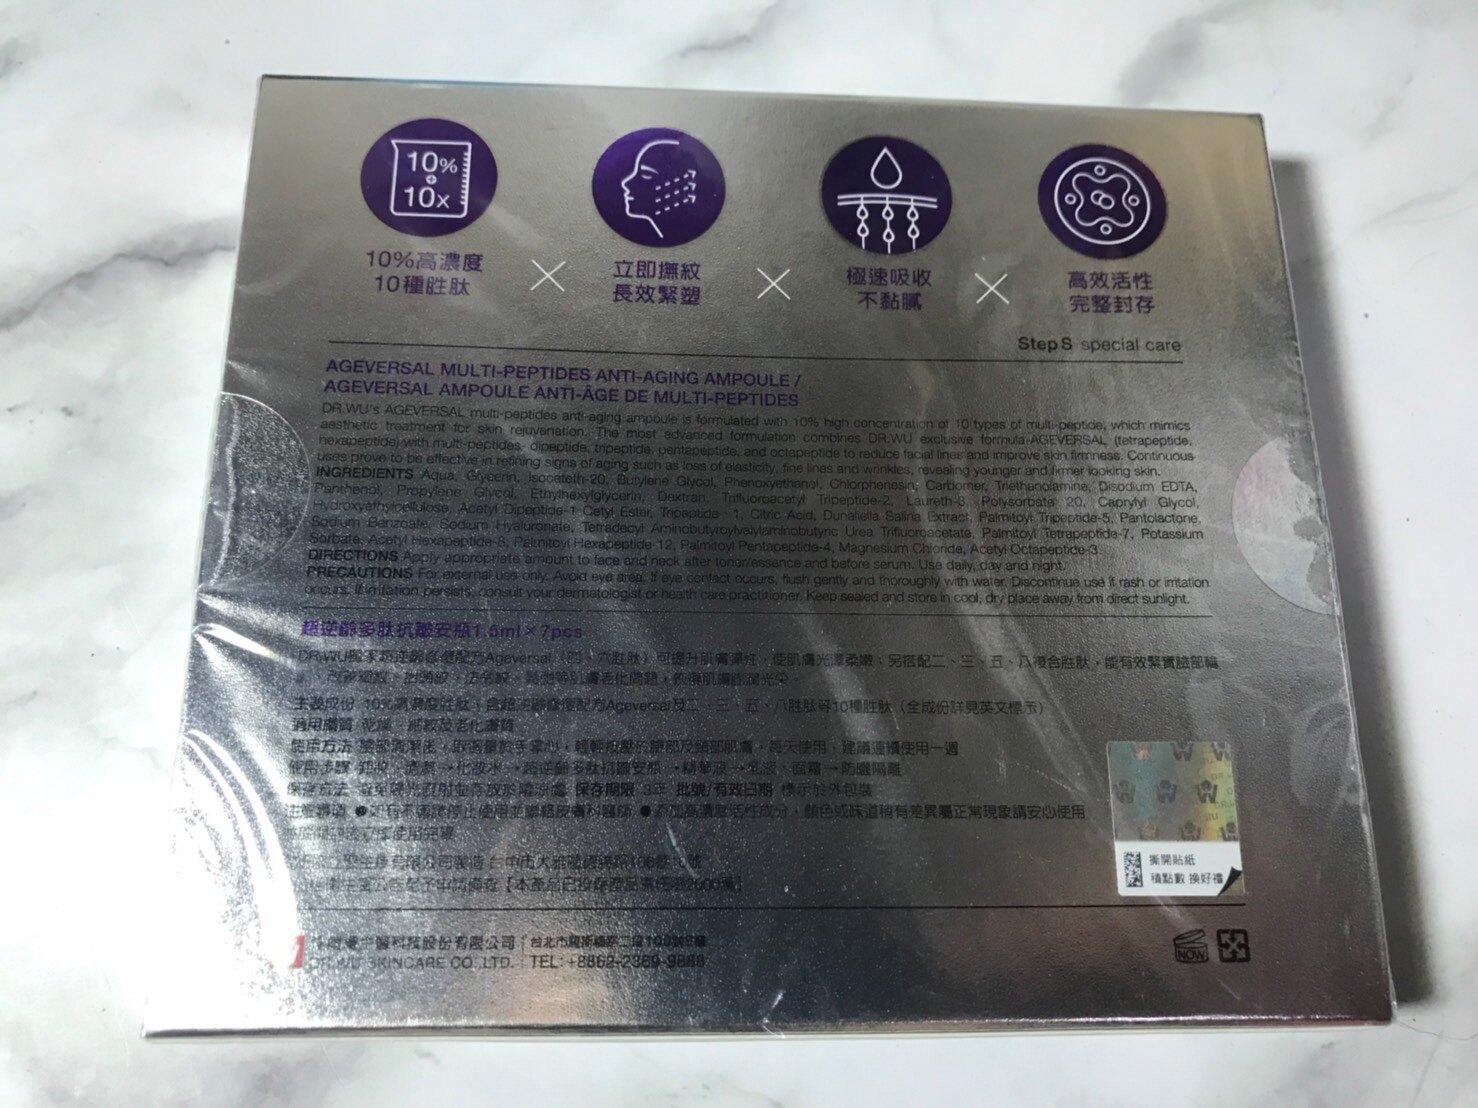 【DR. WU】超逆齡多肽抗皺安瓶1.5ML*7PCS 可集點  效期2023.02【淨妍美肌】